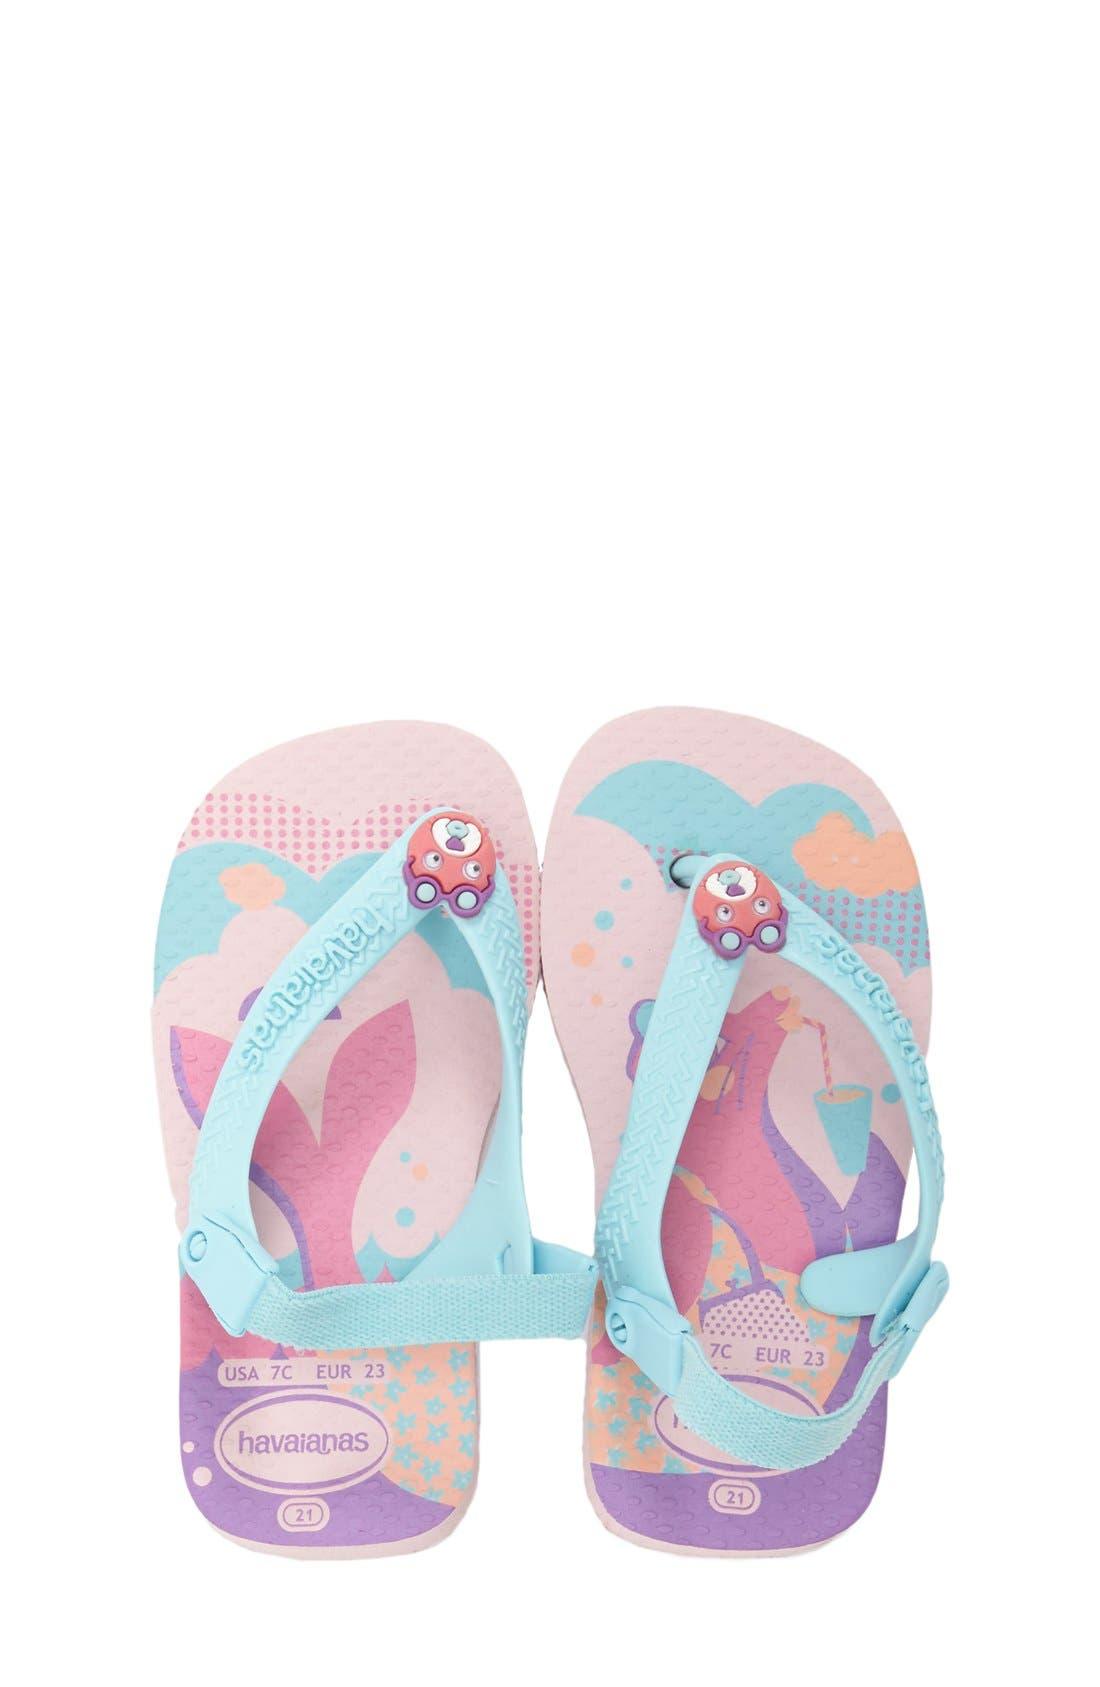 Alternate Image 1 Selected - Havaianas 'Baby Pets' Sandal (Baby, Walker & Toddler)